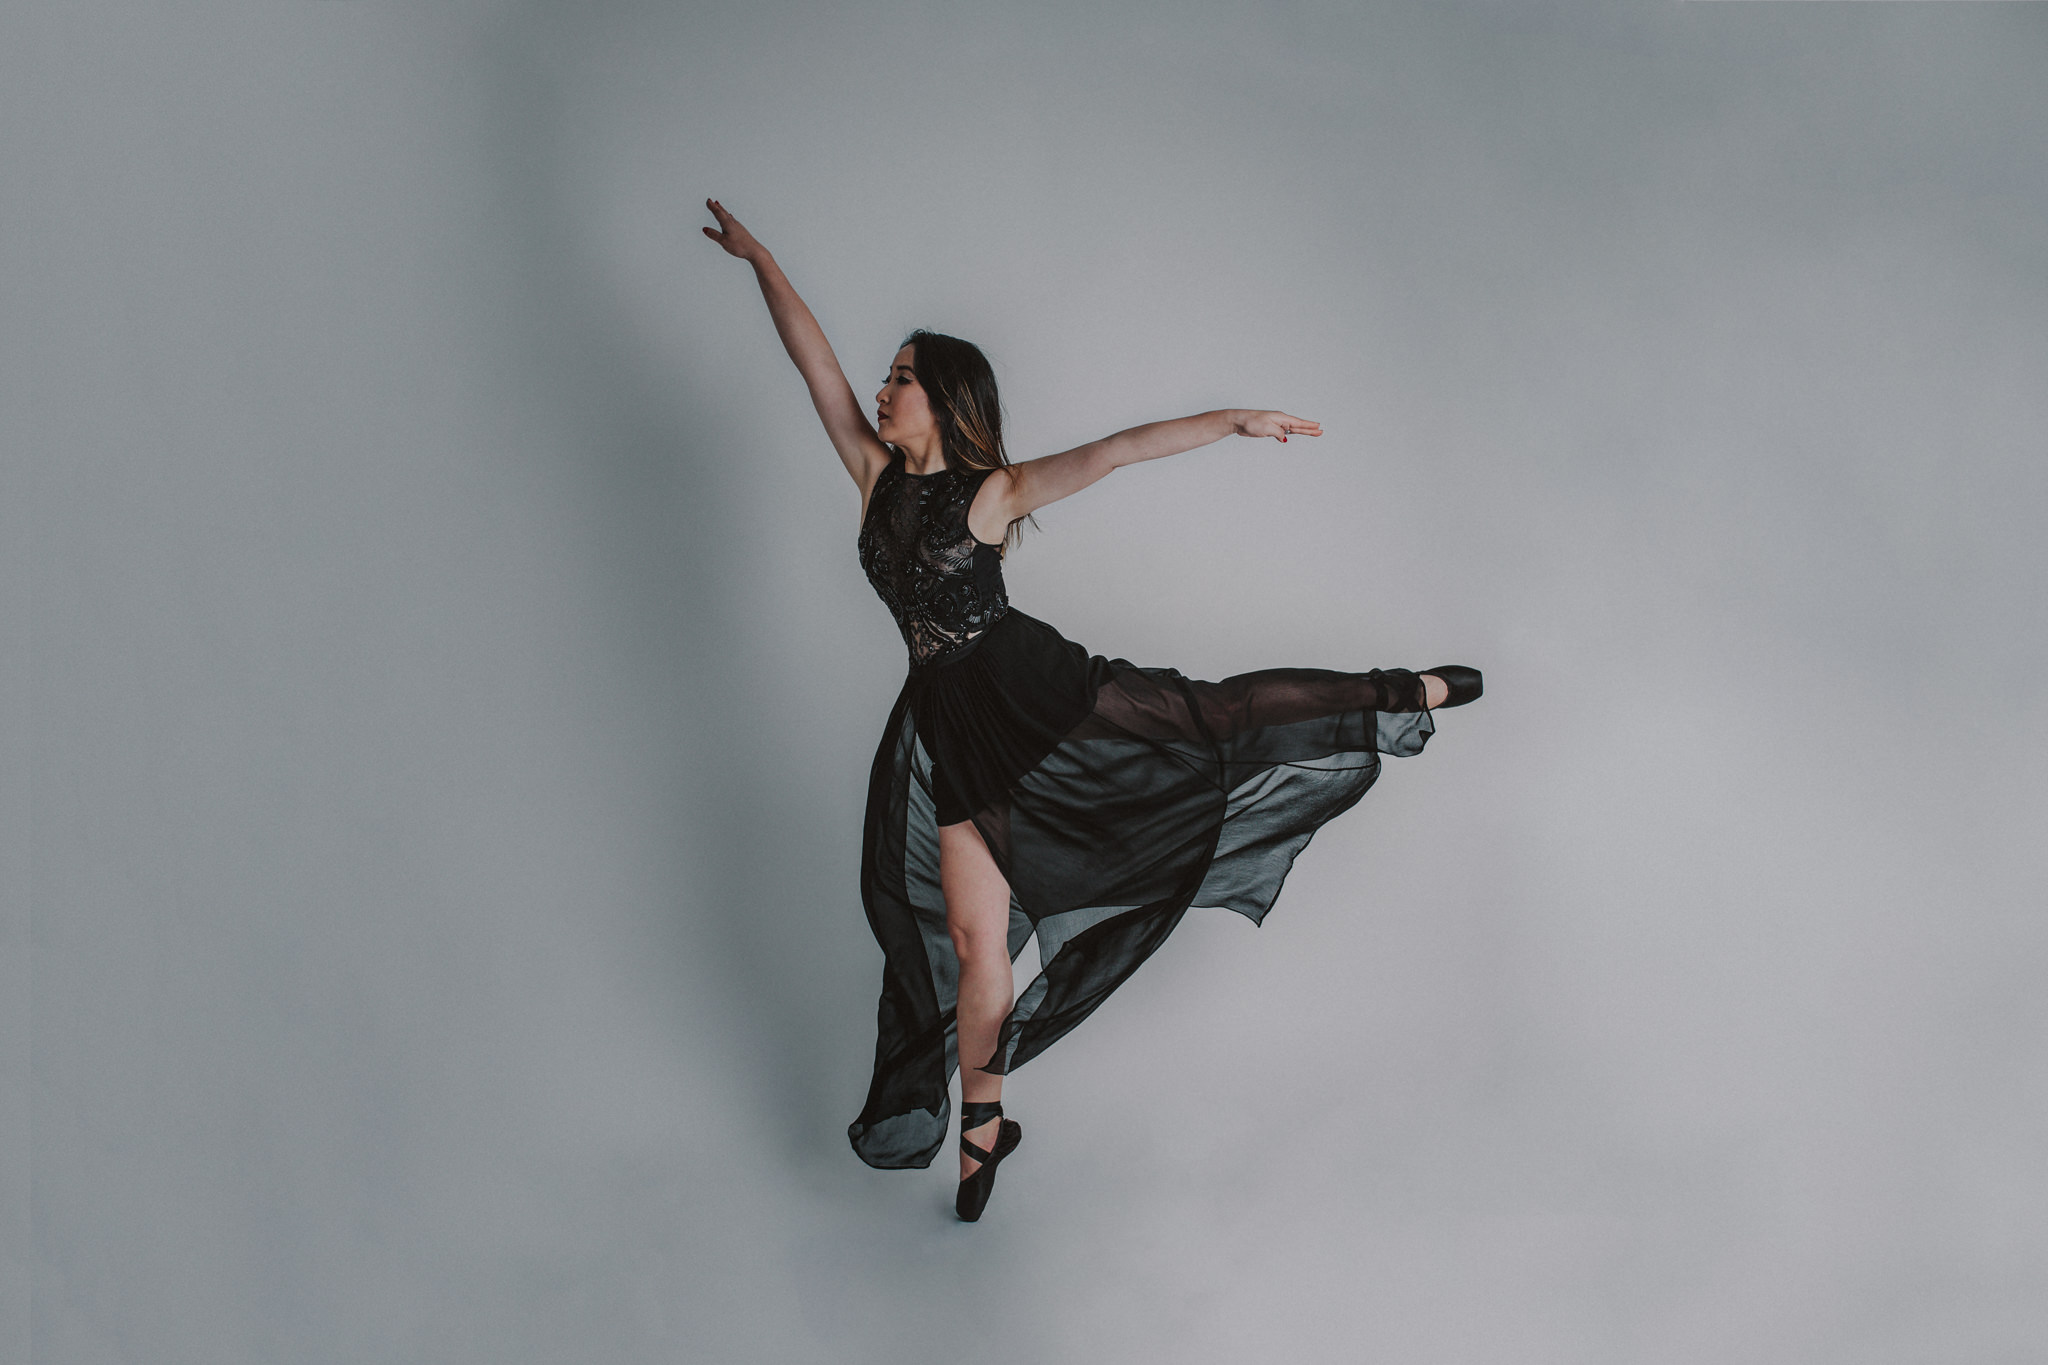 dance in photostudio - model and photographer create amazing photographs